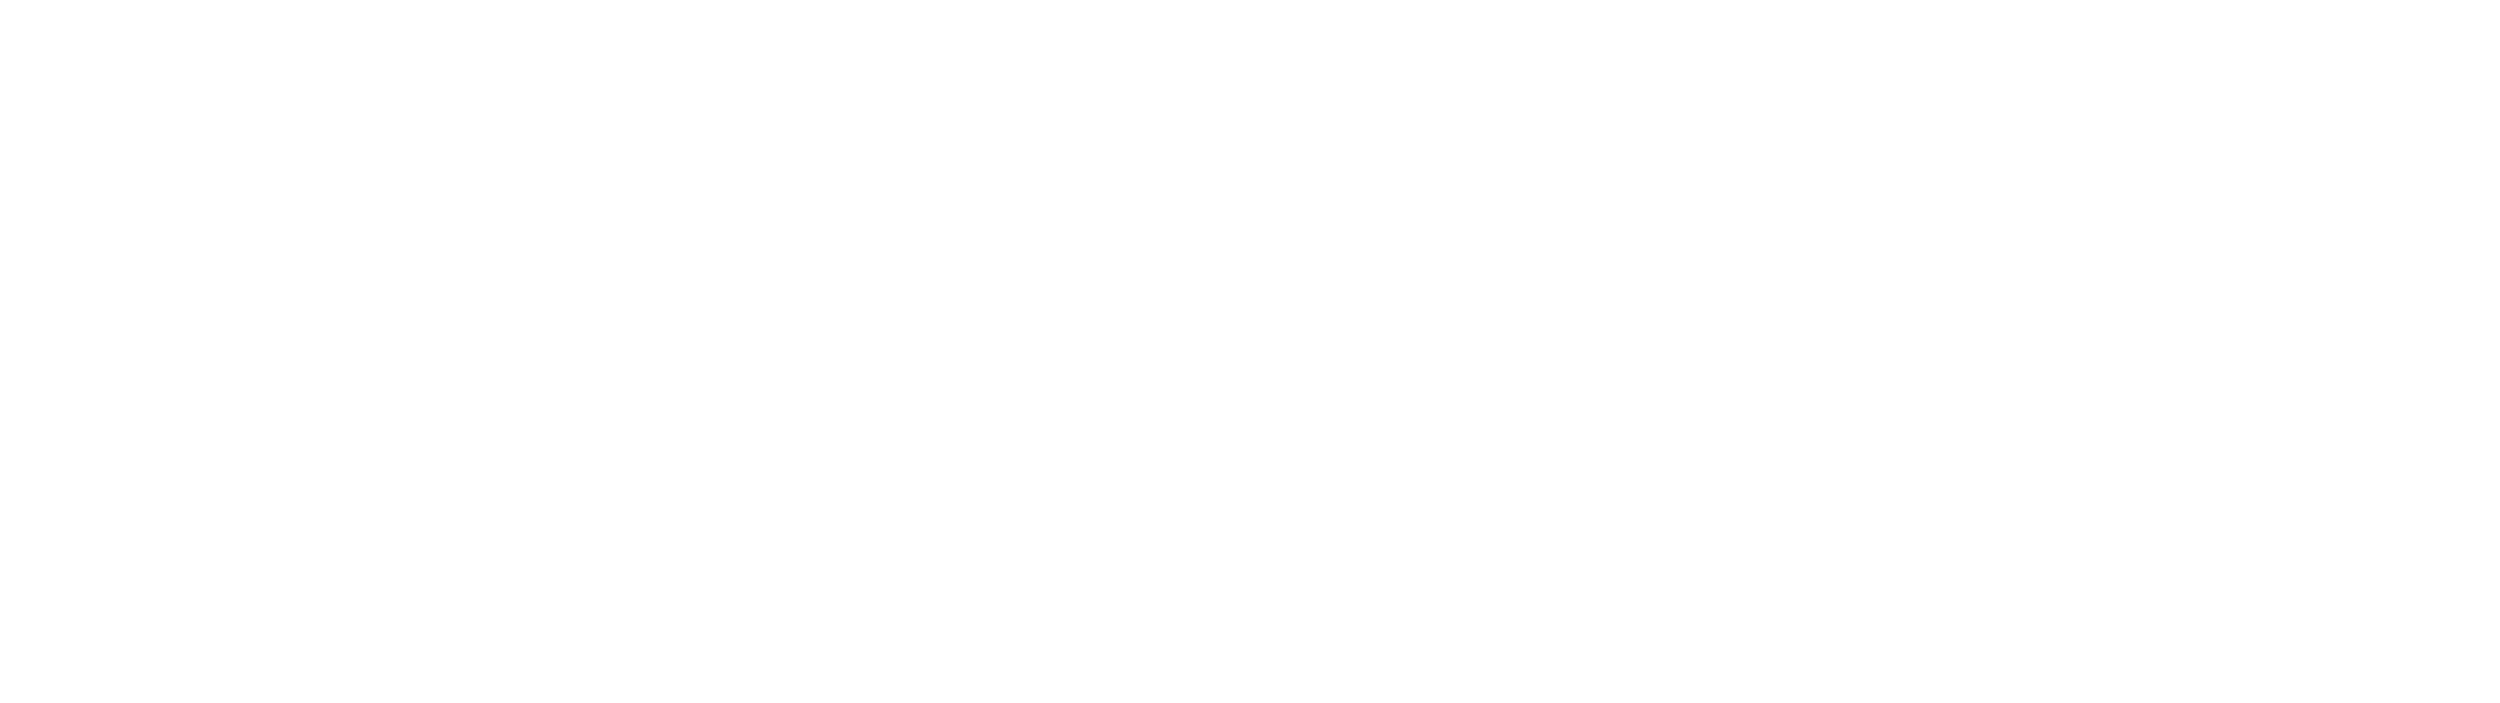 Copy of CameraBits_LogoWhite.png